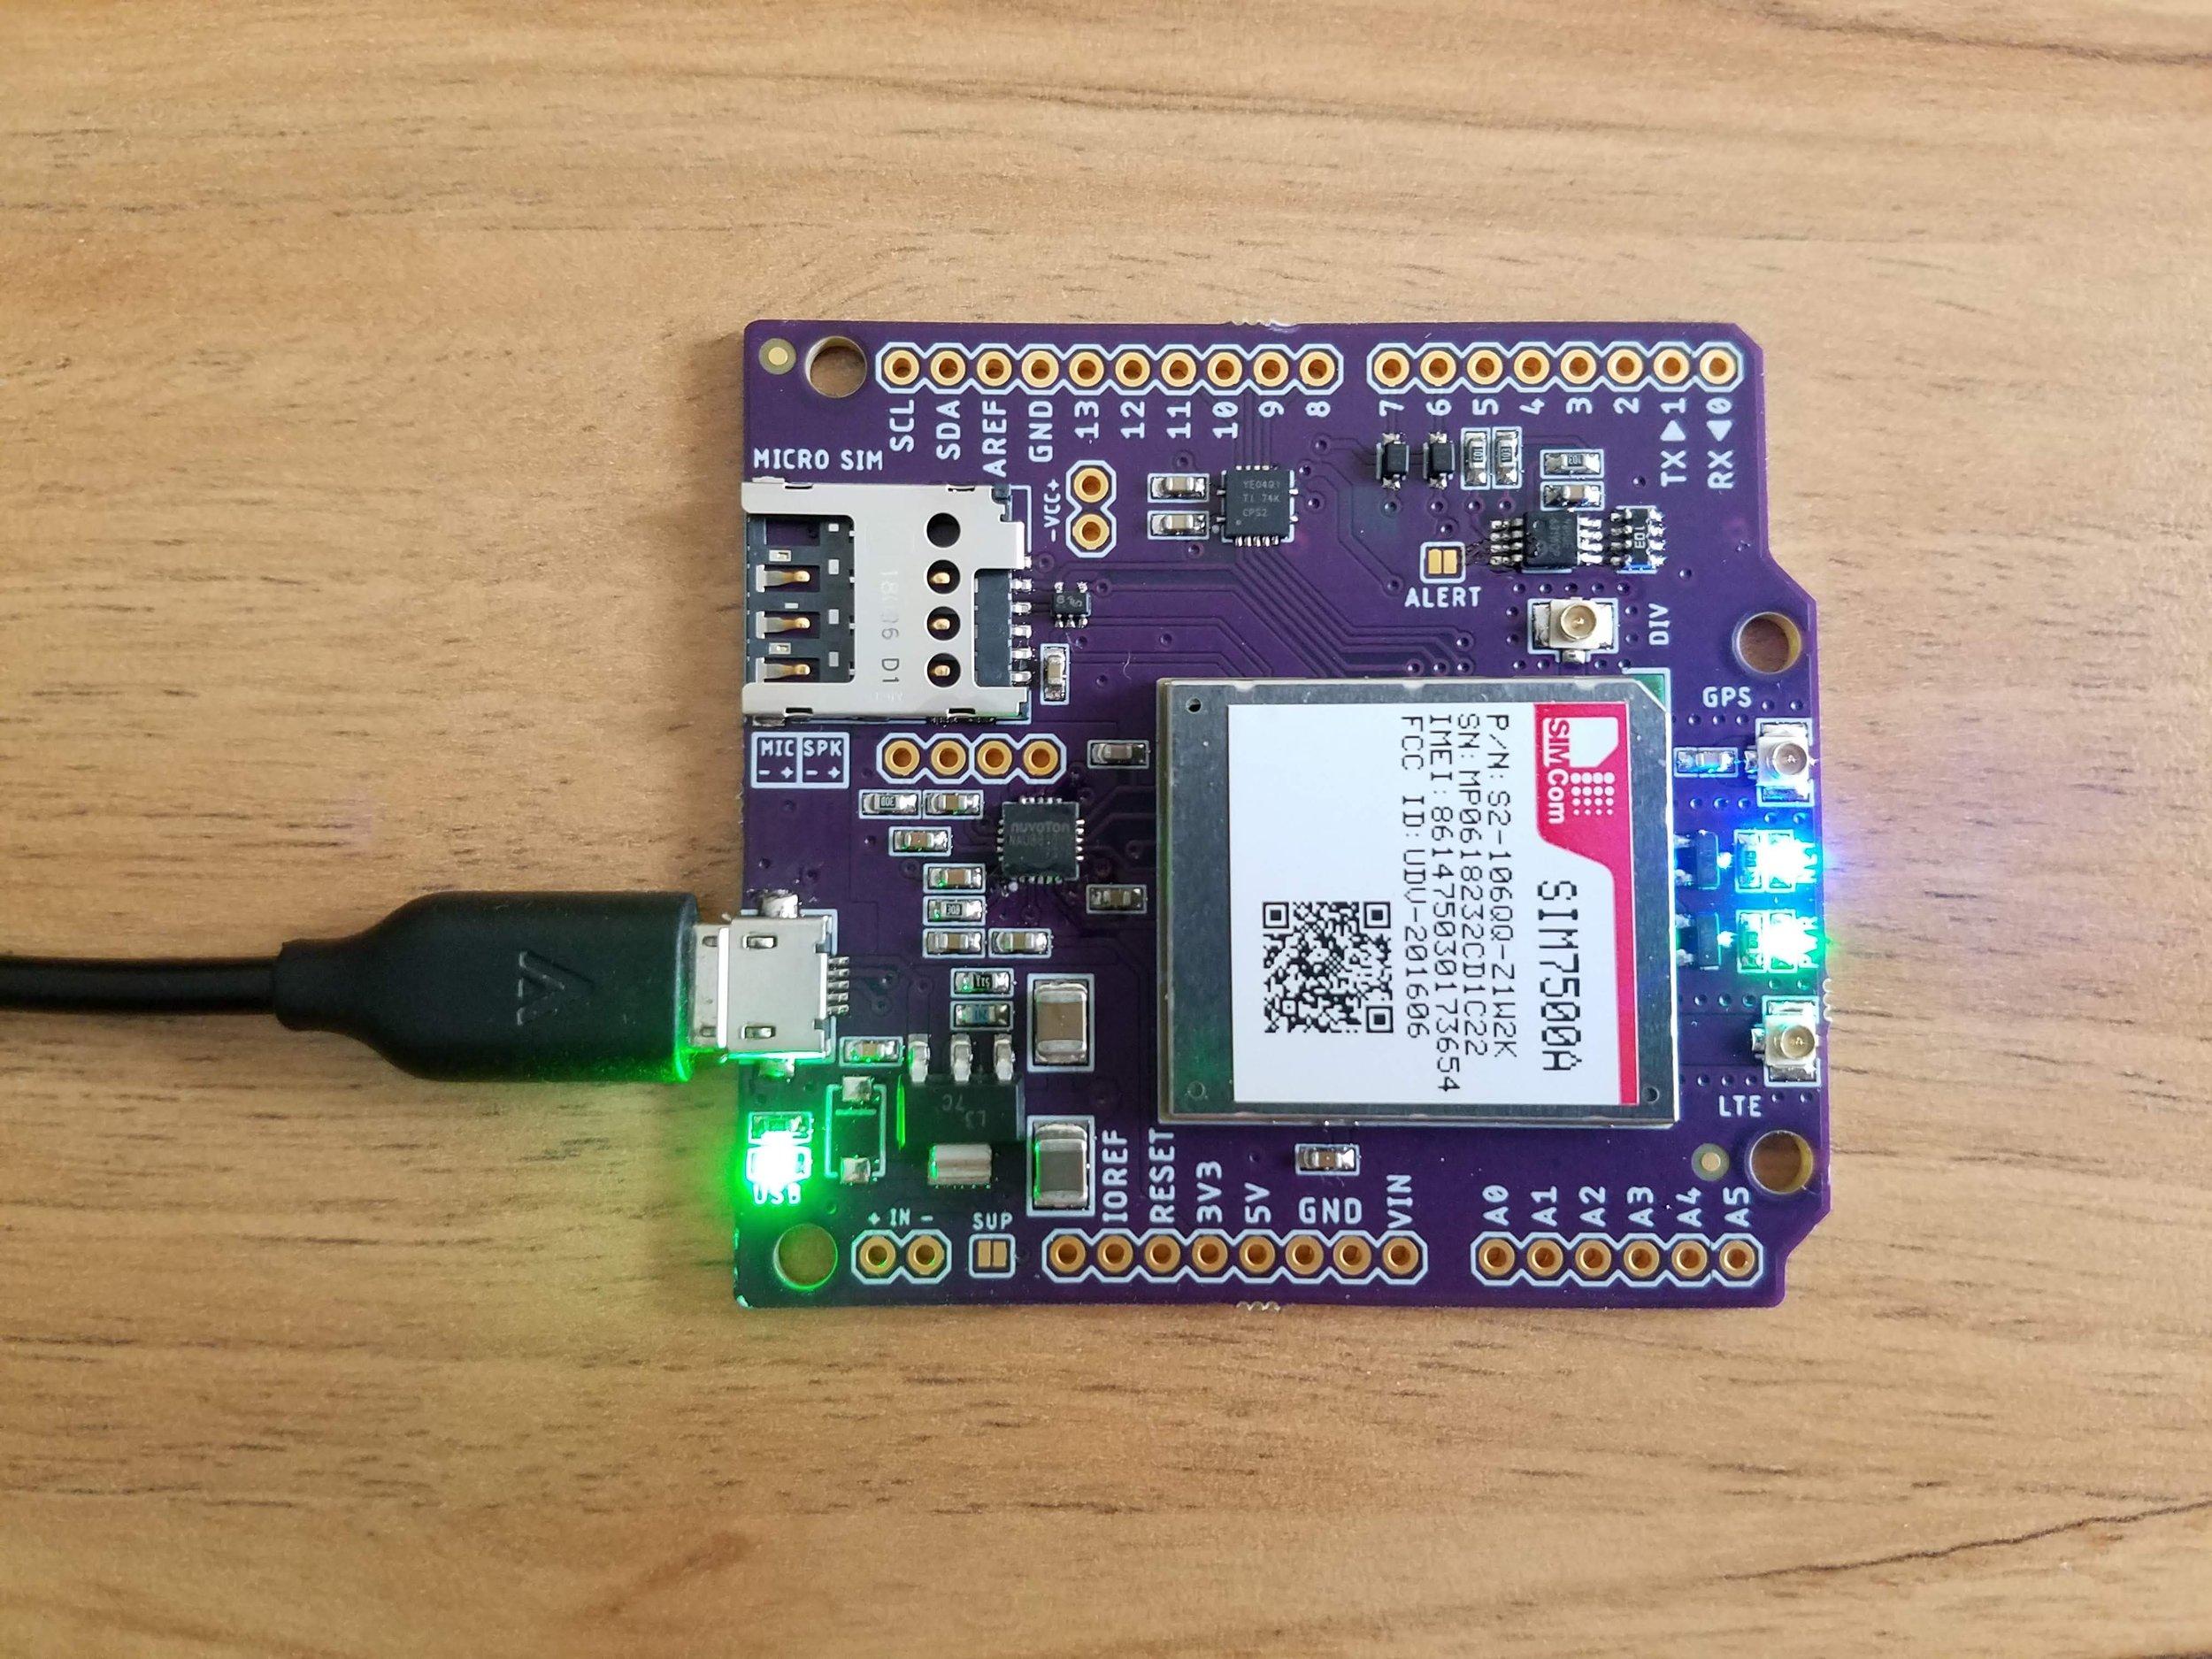 Botletics™ SIM7500 4G LTE + GPS + Voice Shield Kit — Botletics